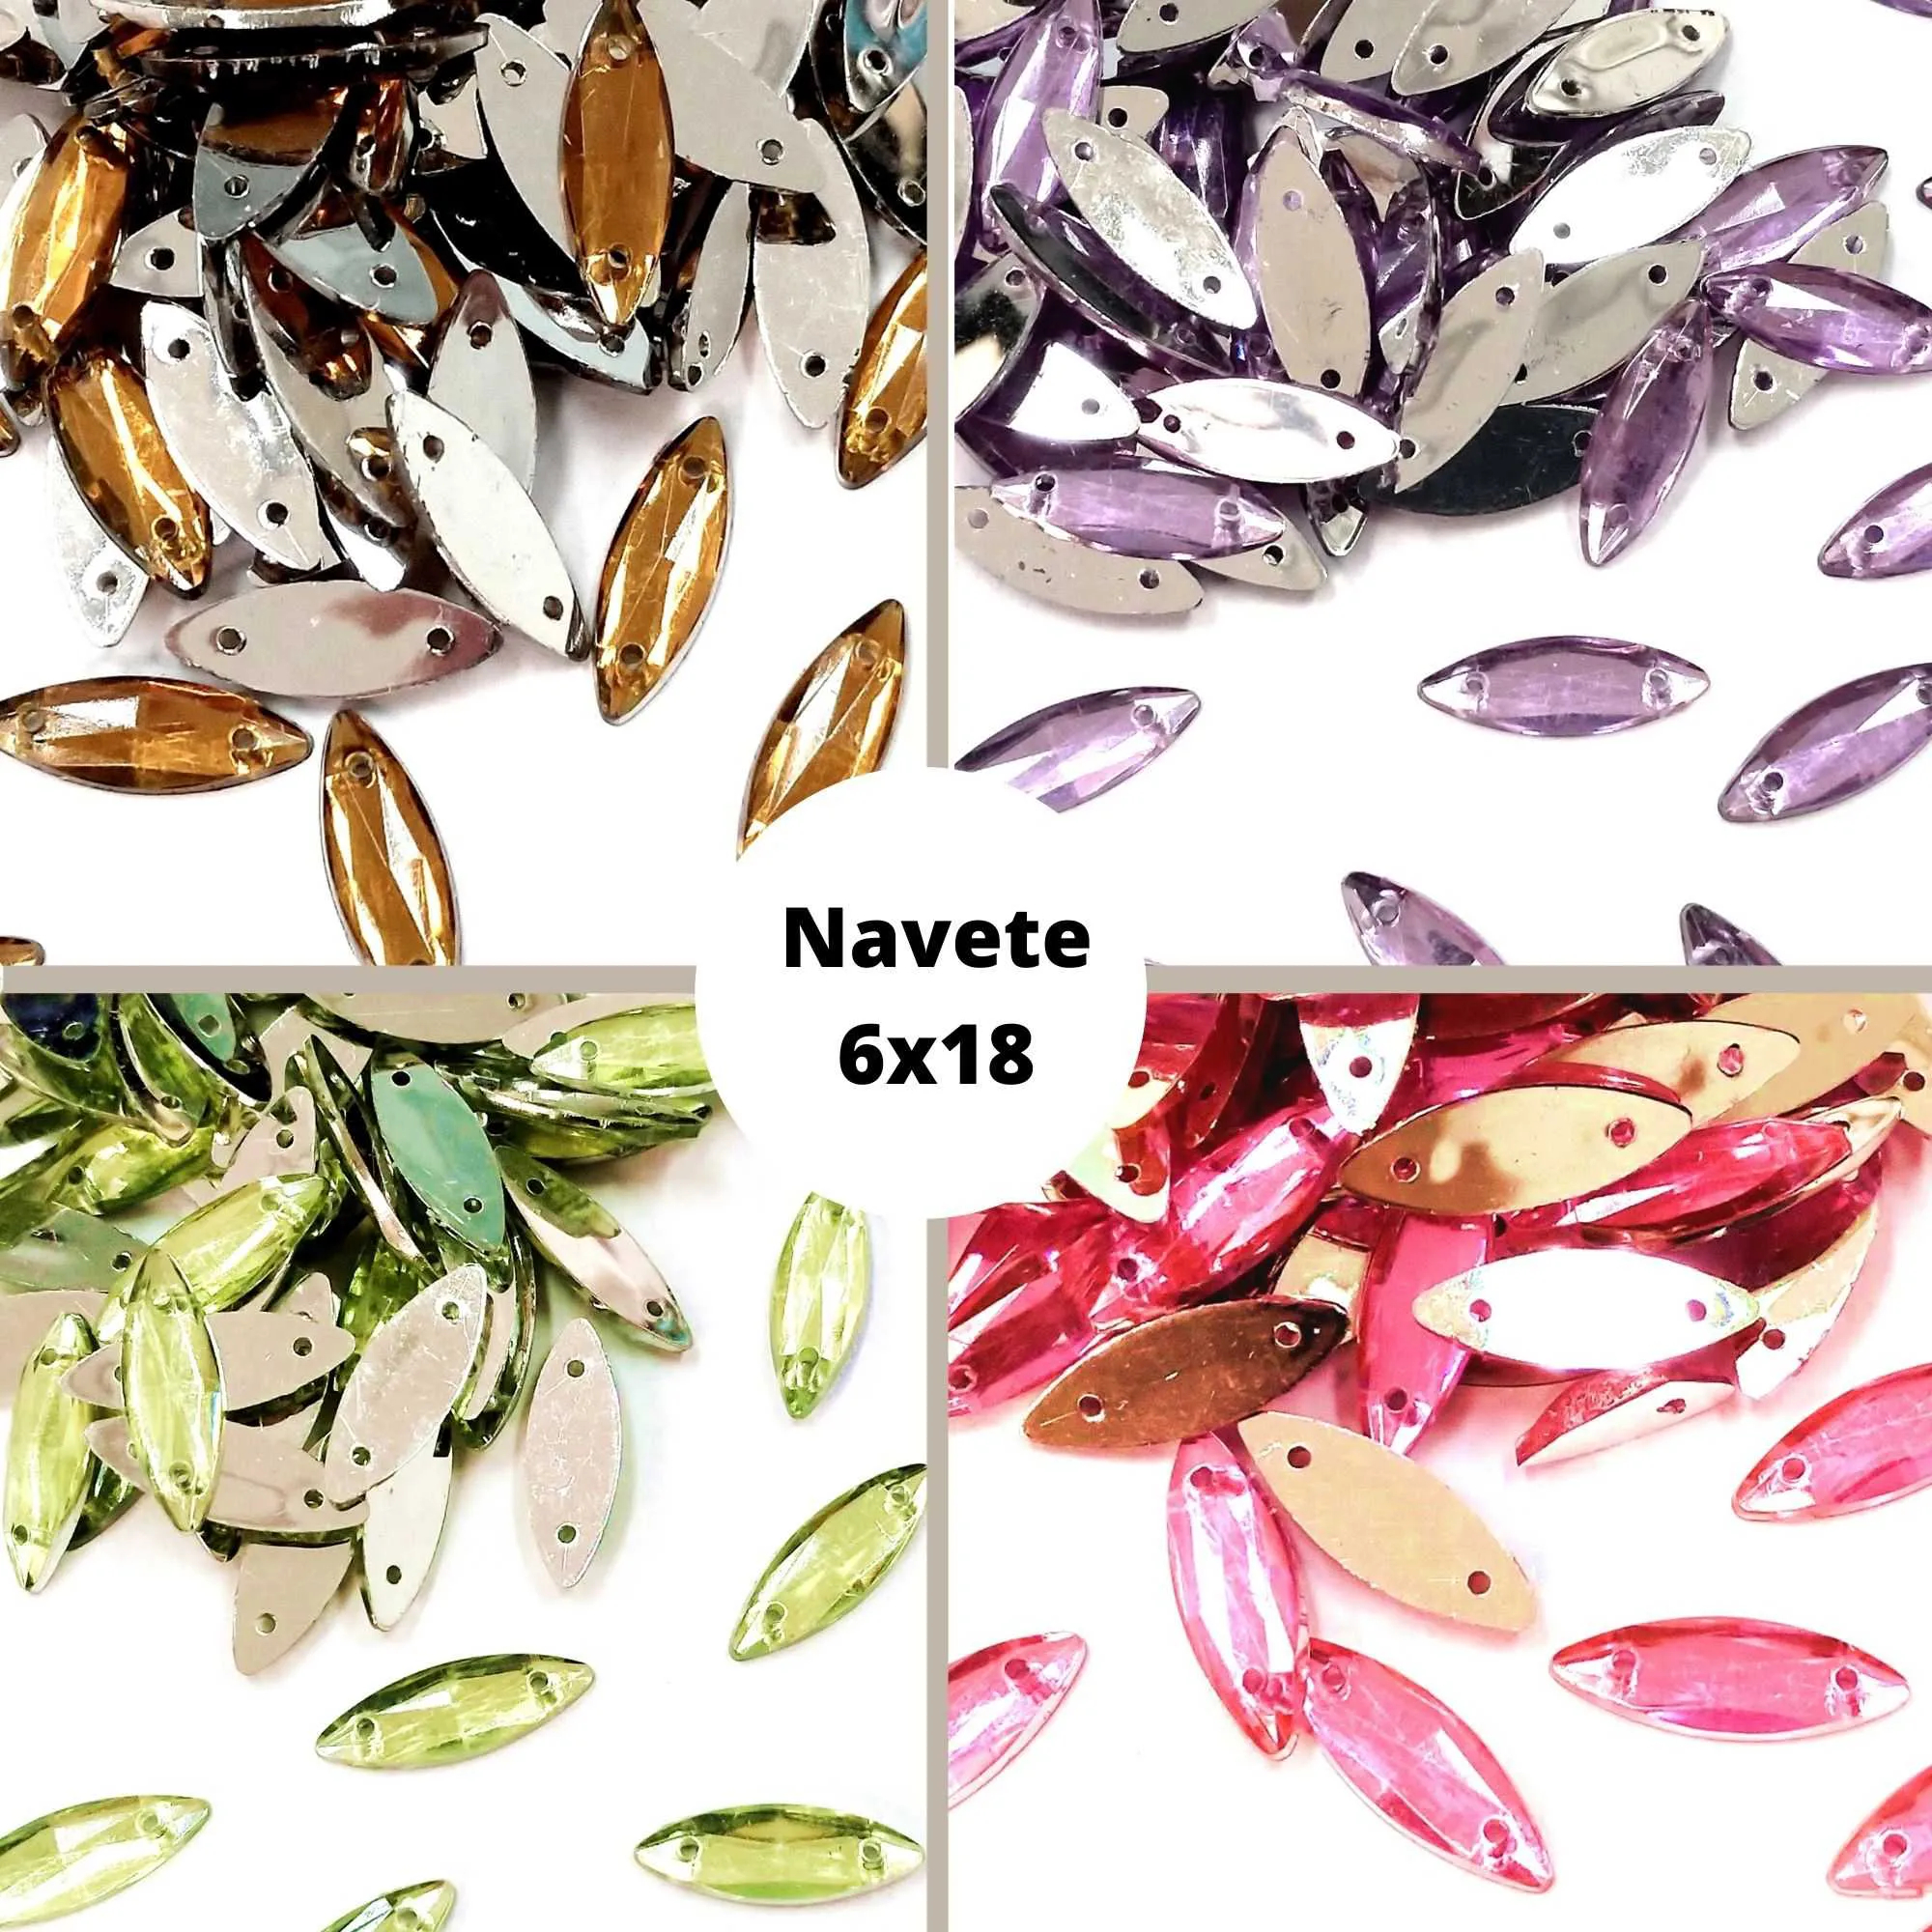 Chaton Navete 6x18 - Pacote com 200 unidades